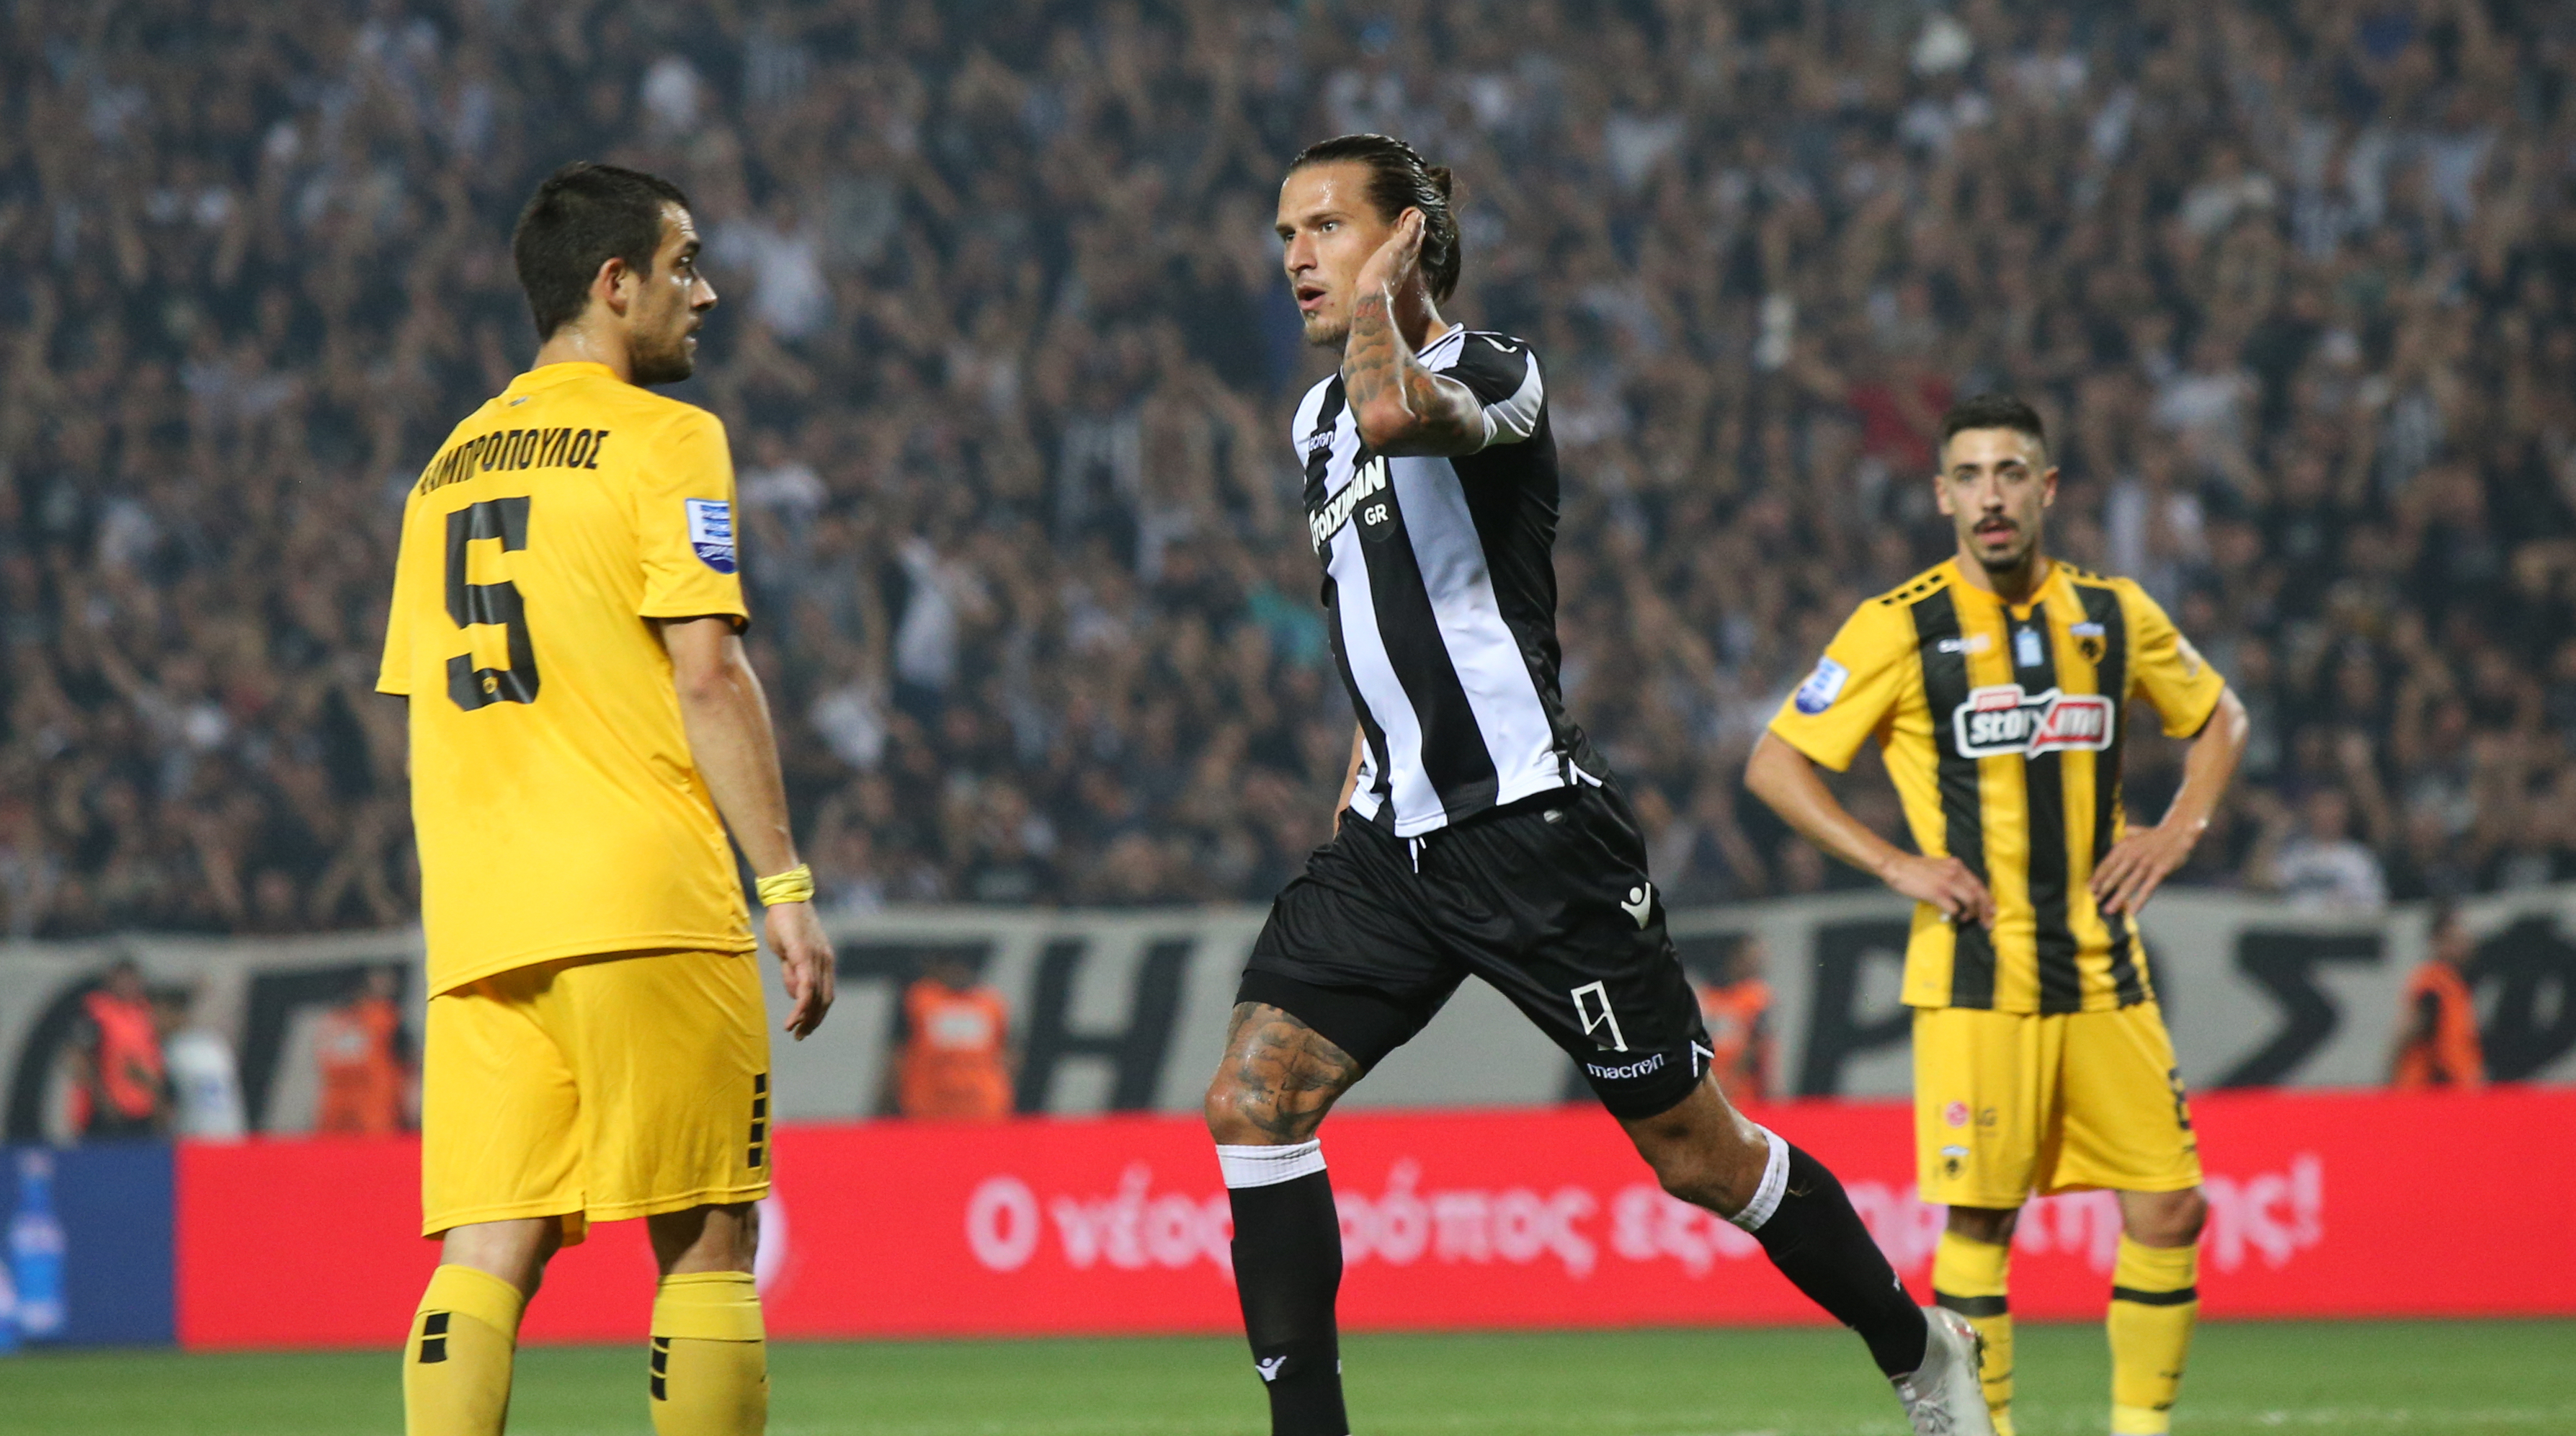 PAOK FC-AEK FC 2-0